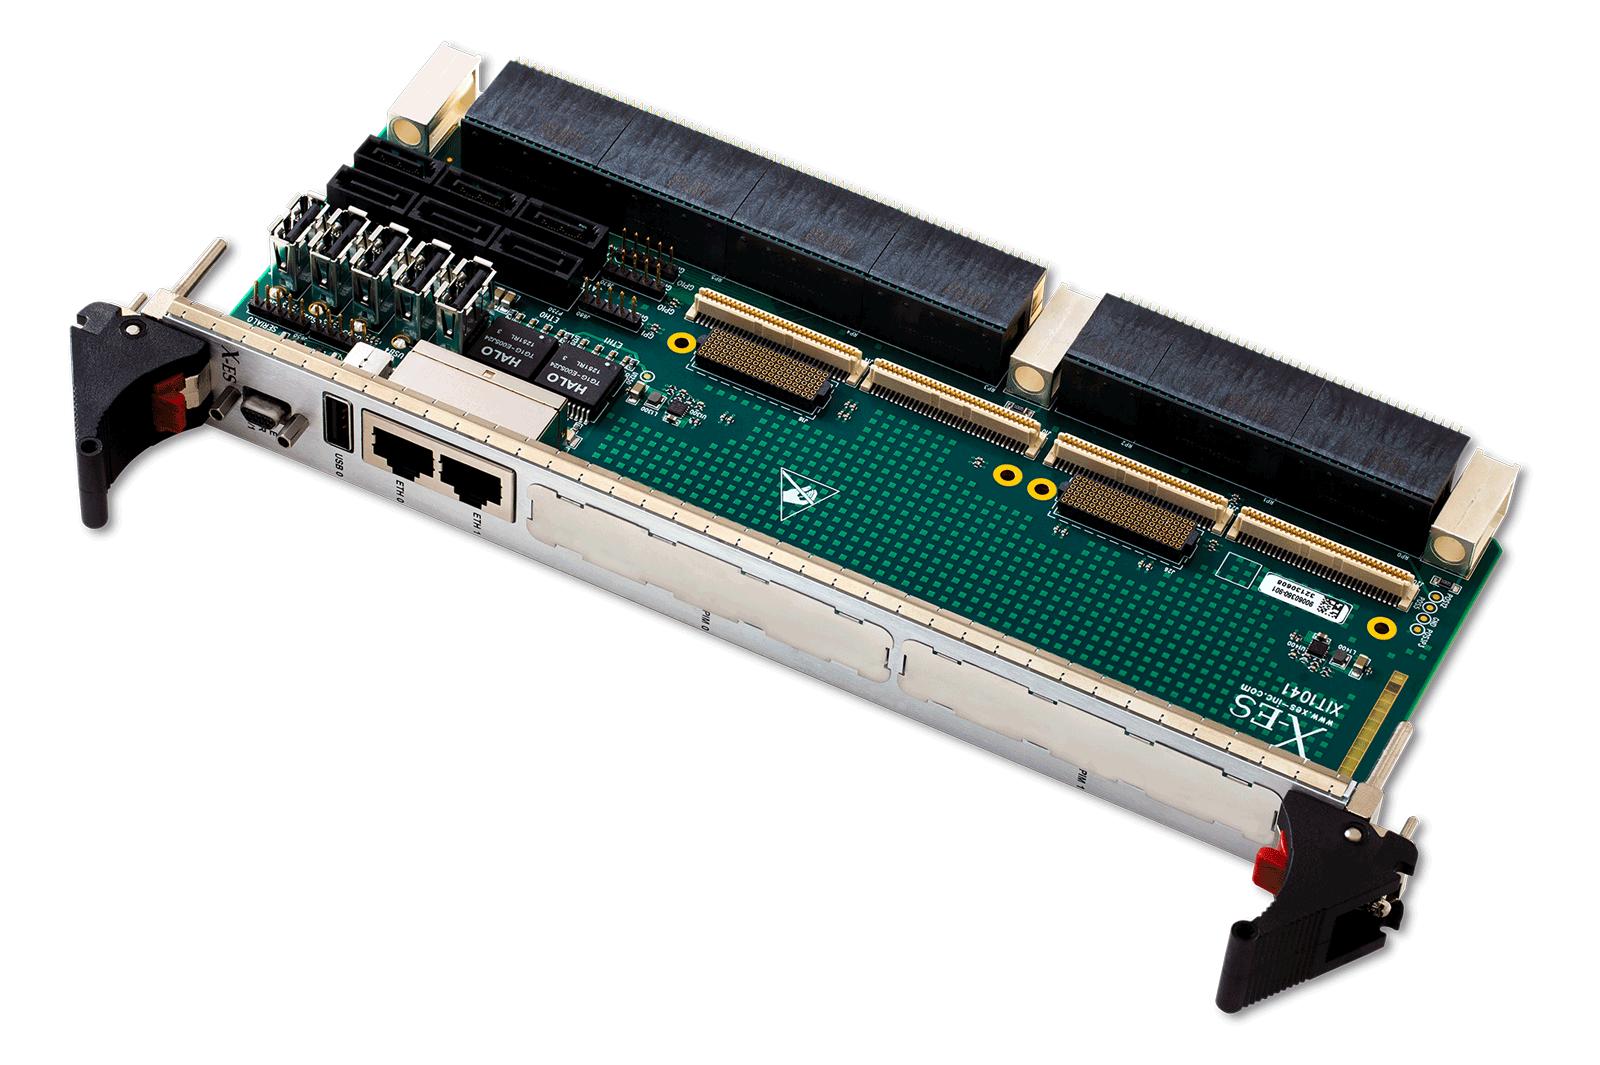 Xit1041 6u Vpx Rtm With Gbe Sata Usb Serial Pim Xim To Converter Circuit Diagram